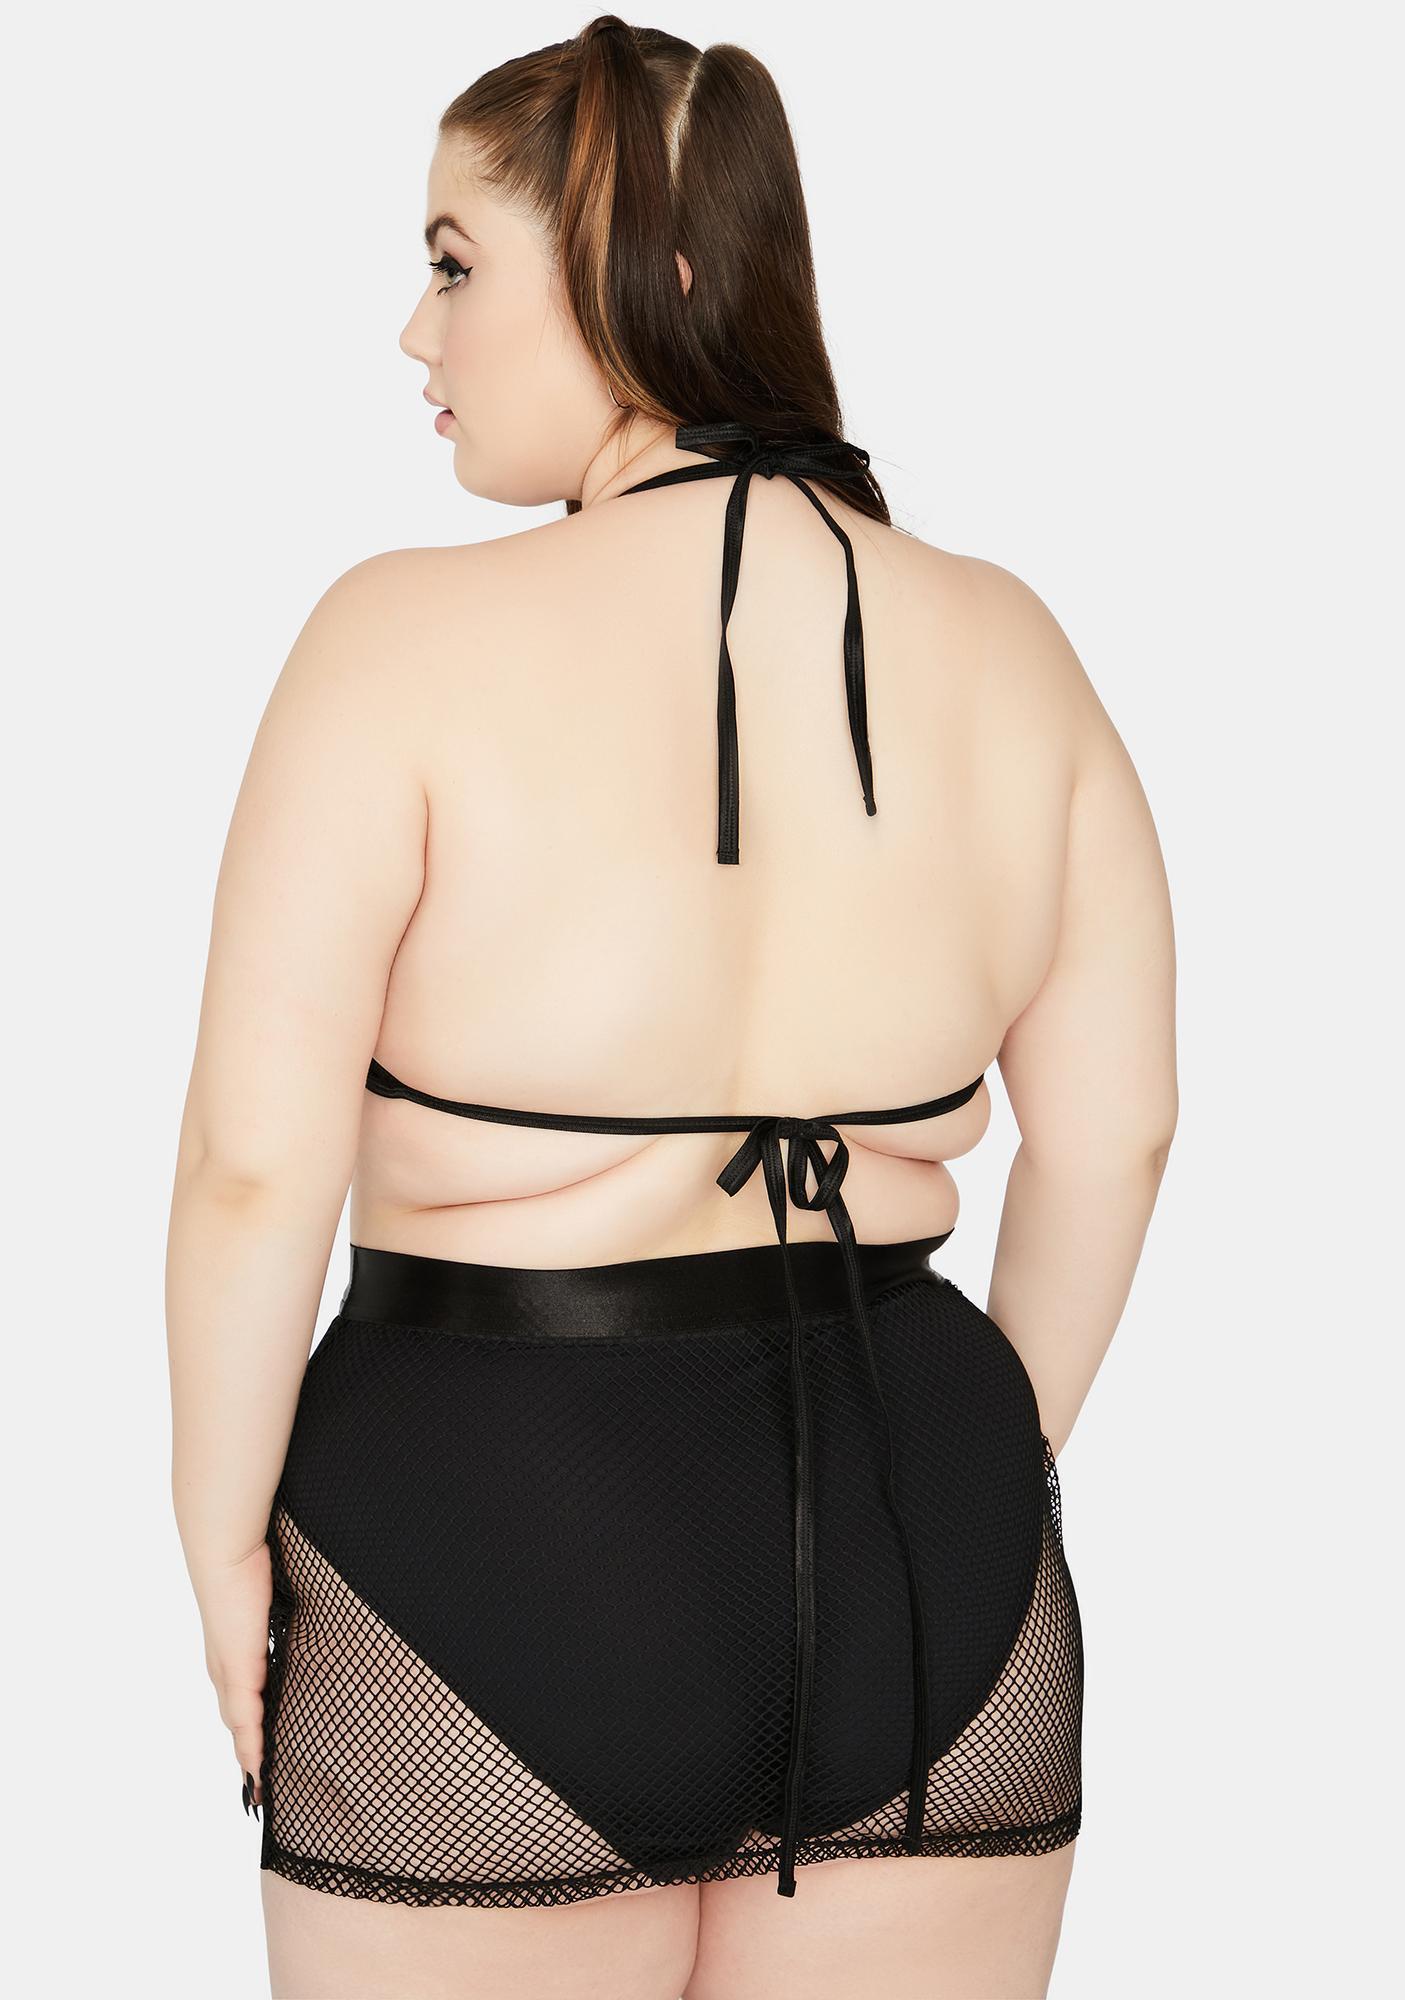 Club Exx She's Techno Sexual Fishnet Skirt Set